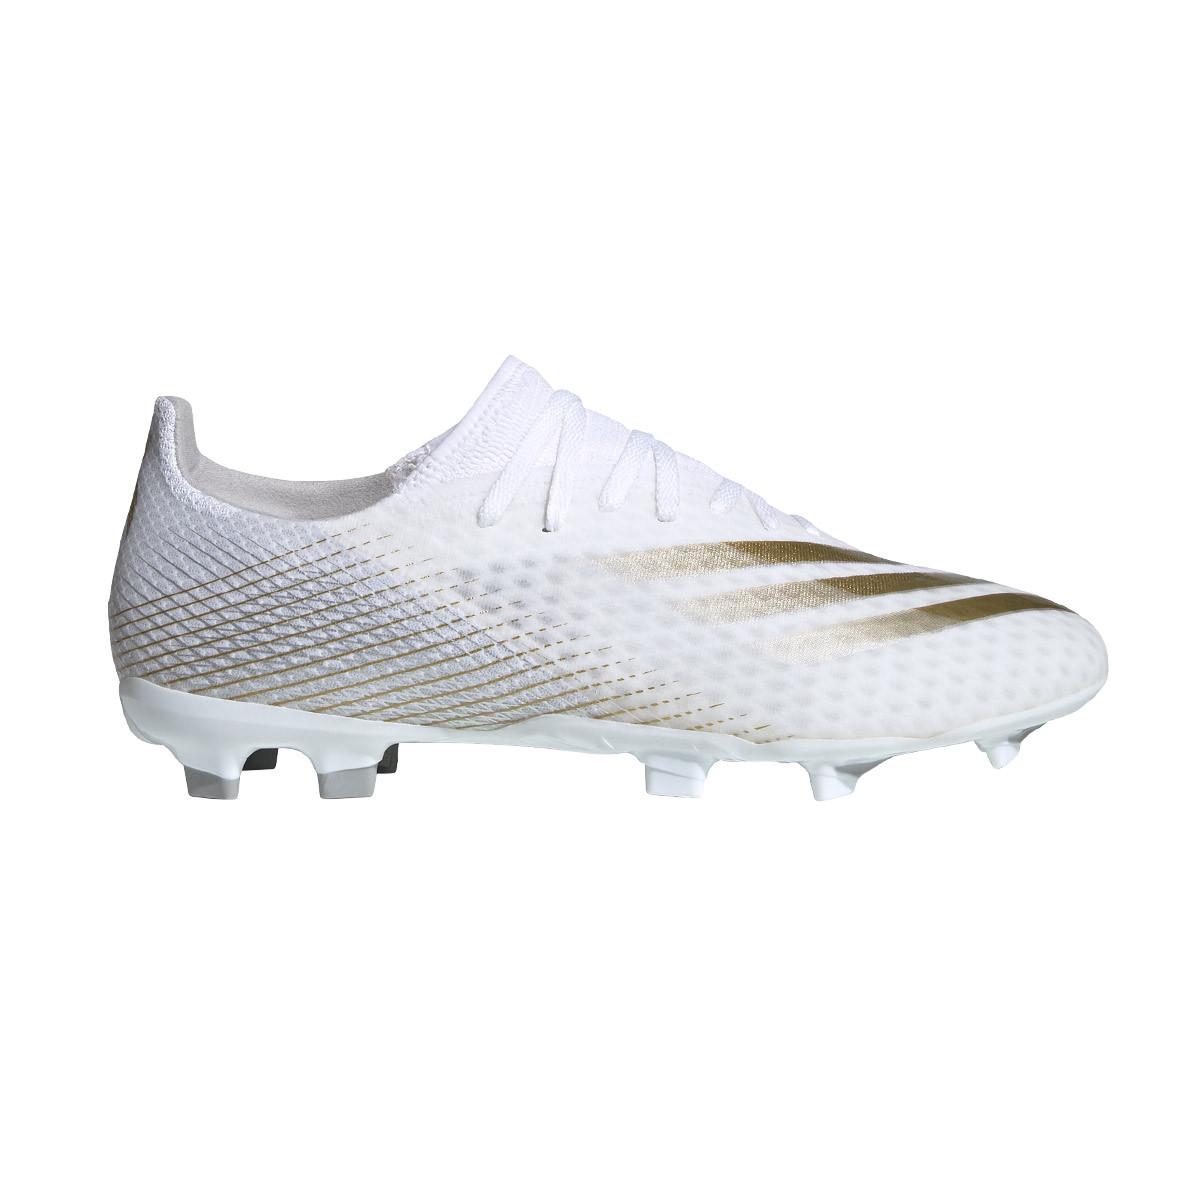 Football Boots Adidas X Ghosted 3 Fg White Metallic Gold Melange Silver Metallic Football Store Futbol Emotion